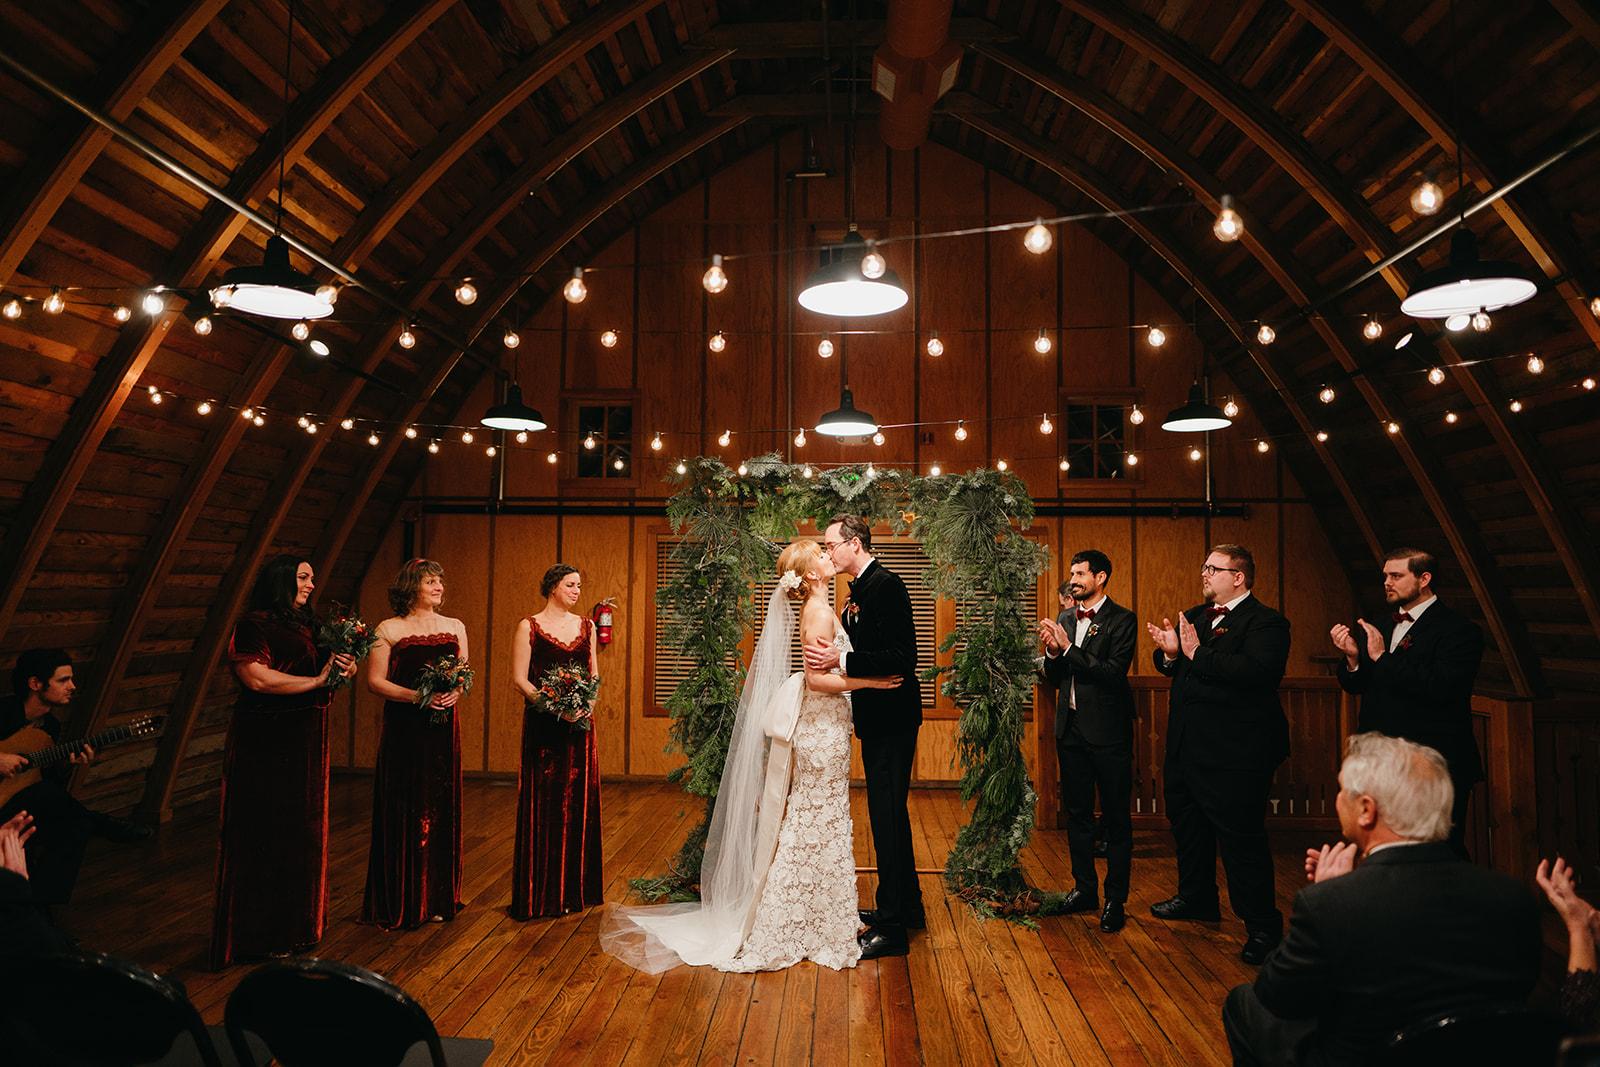 wedding ceremony at Hollinshead Barn